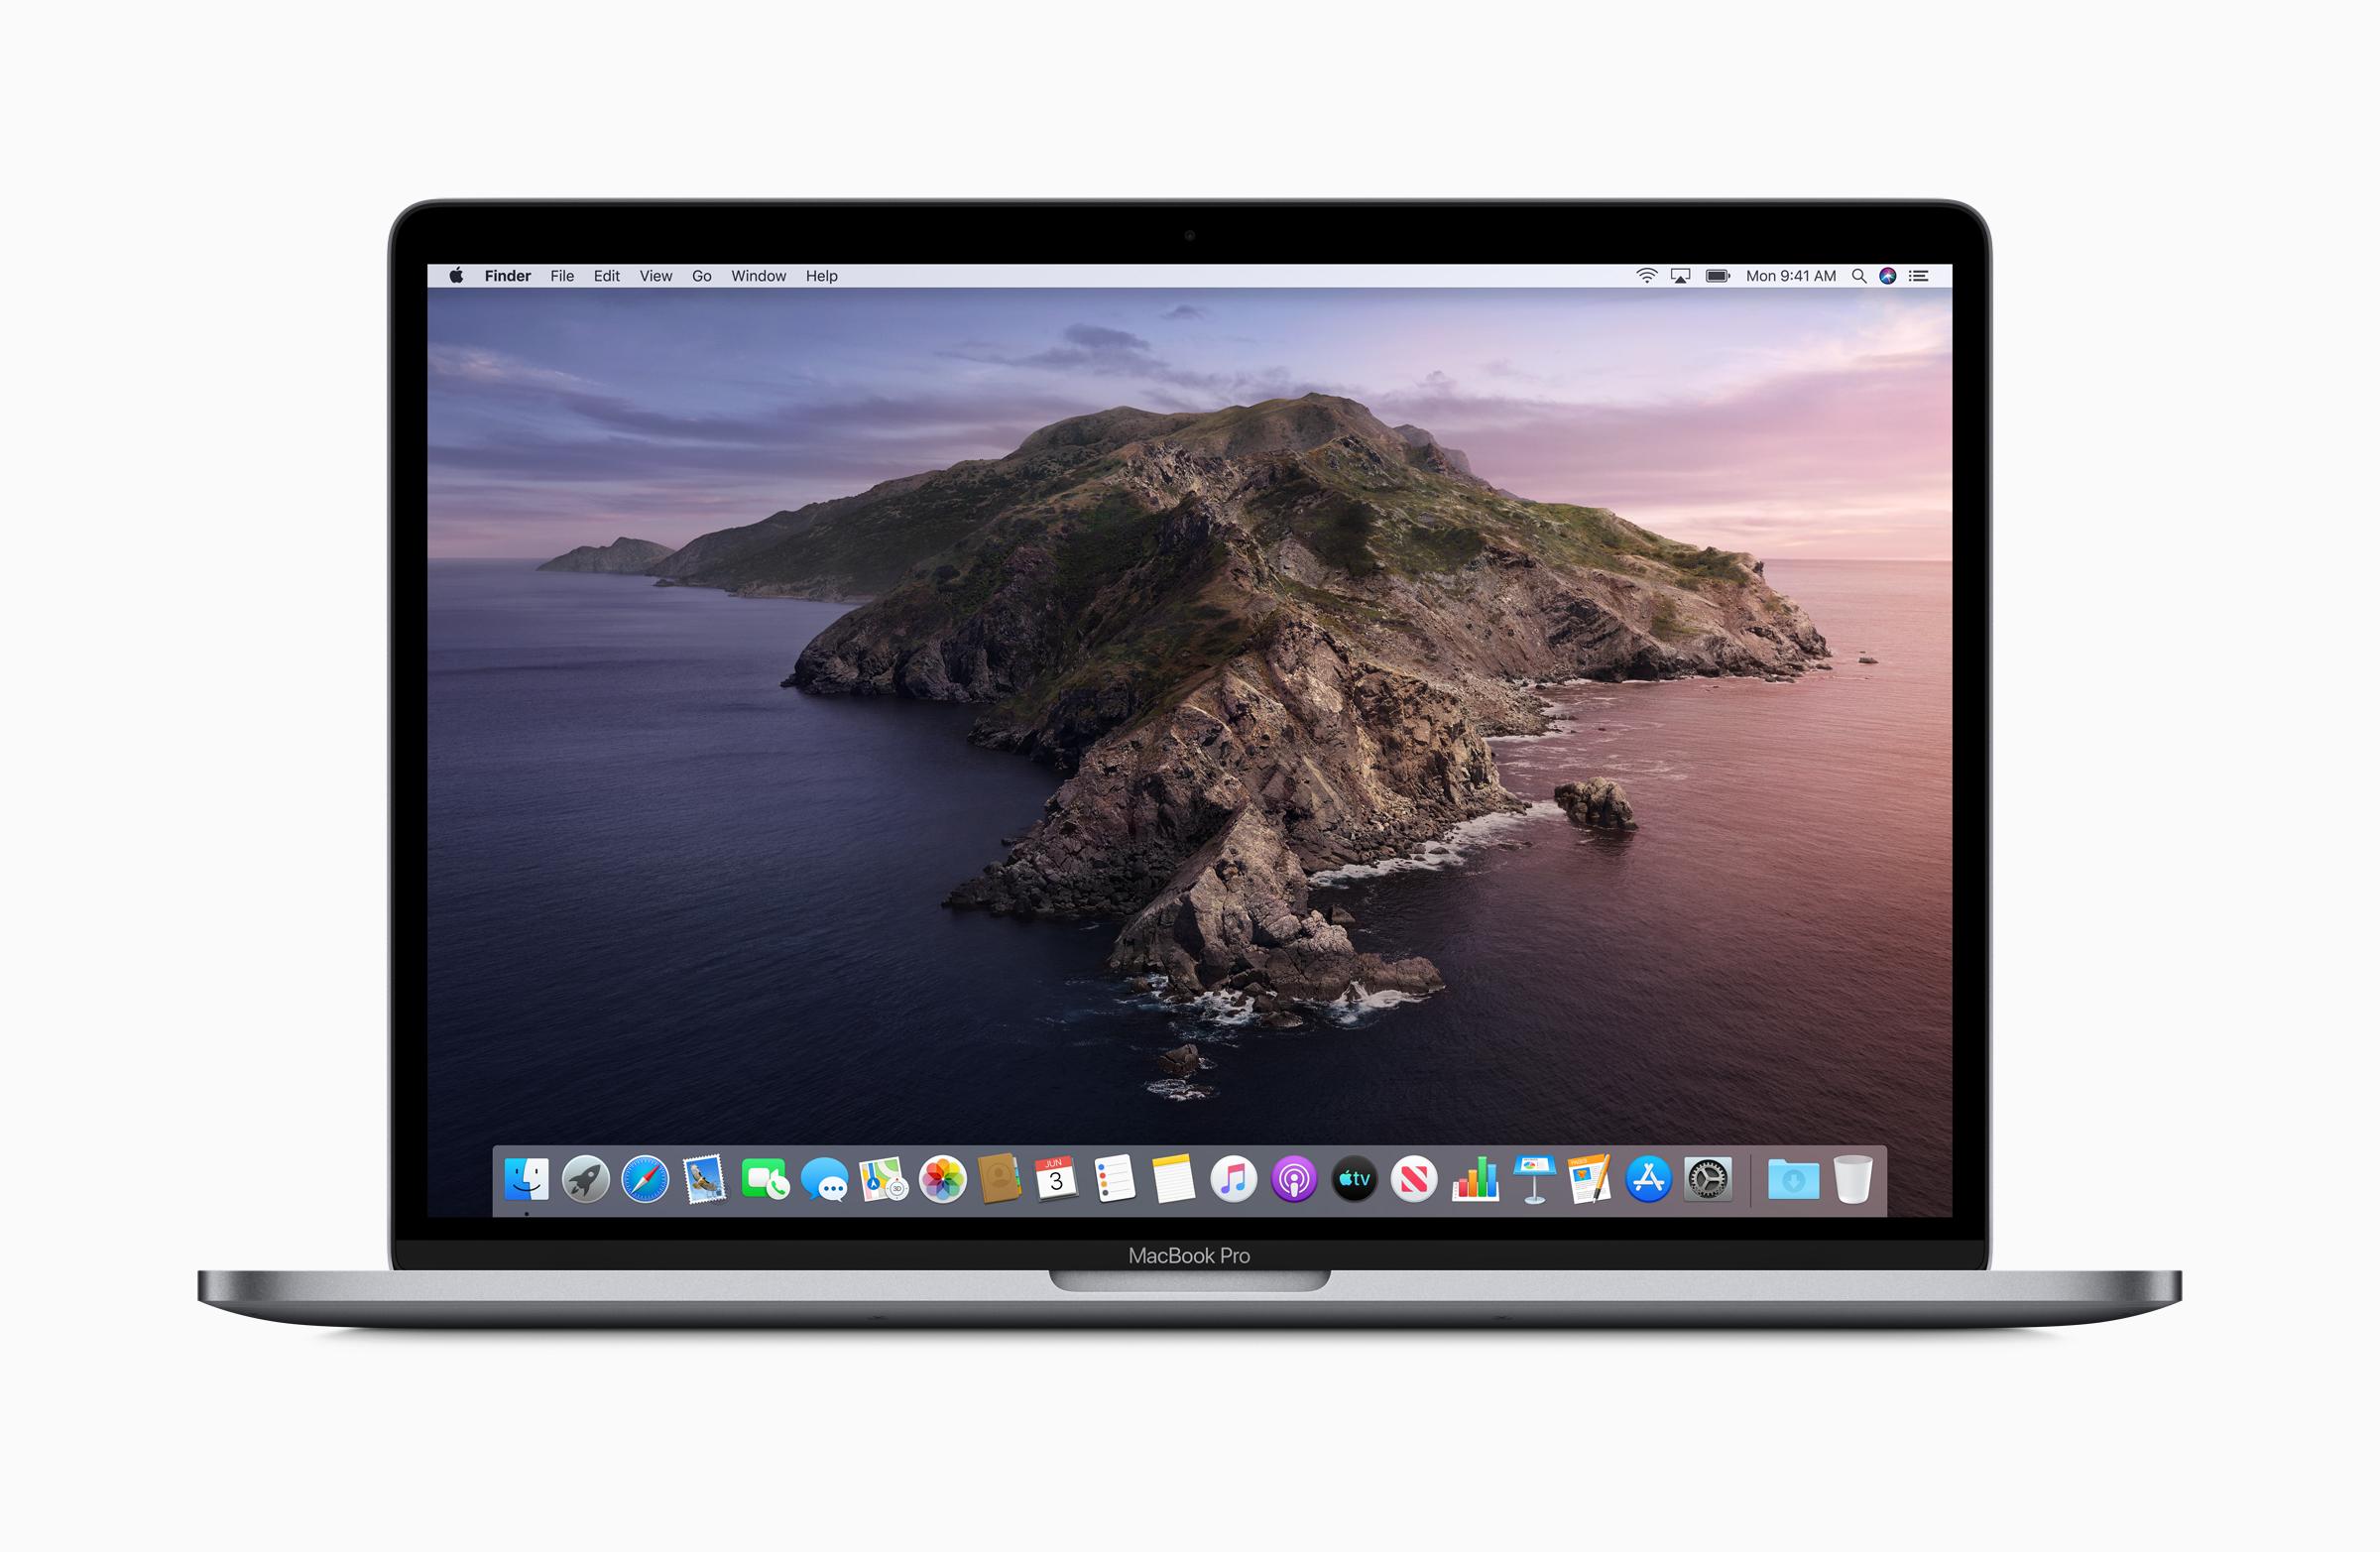 Mac os catalina on 2015 macbook pro